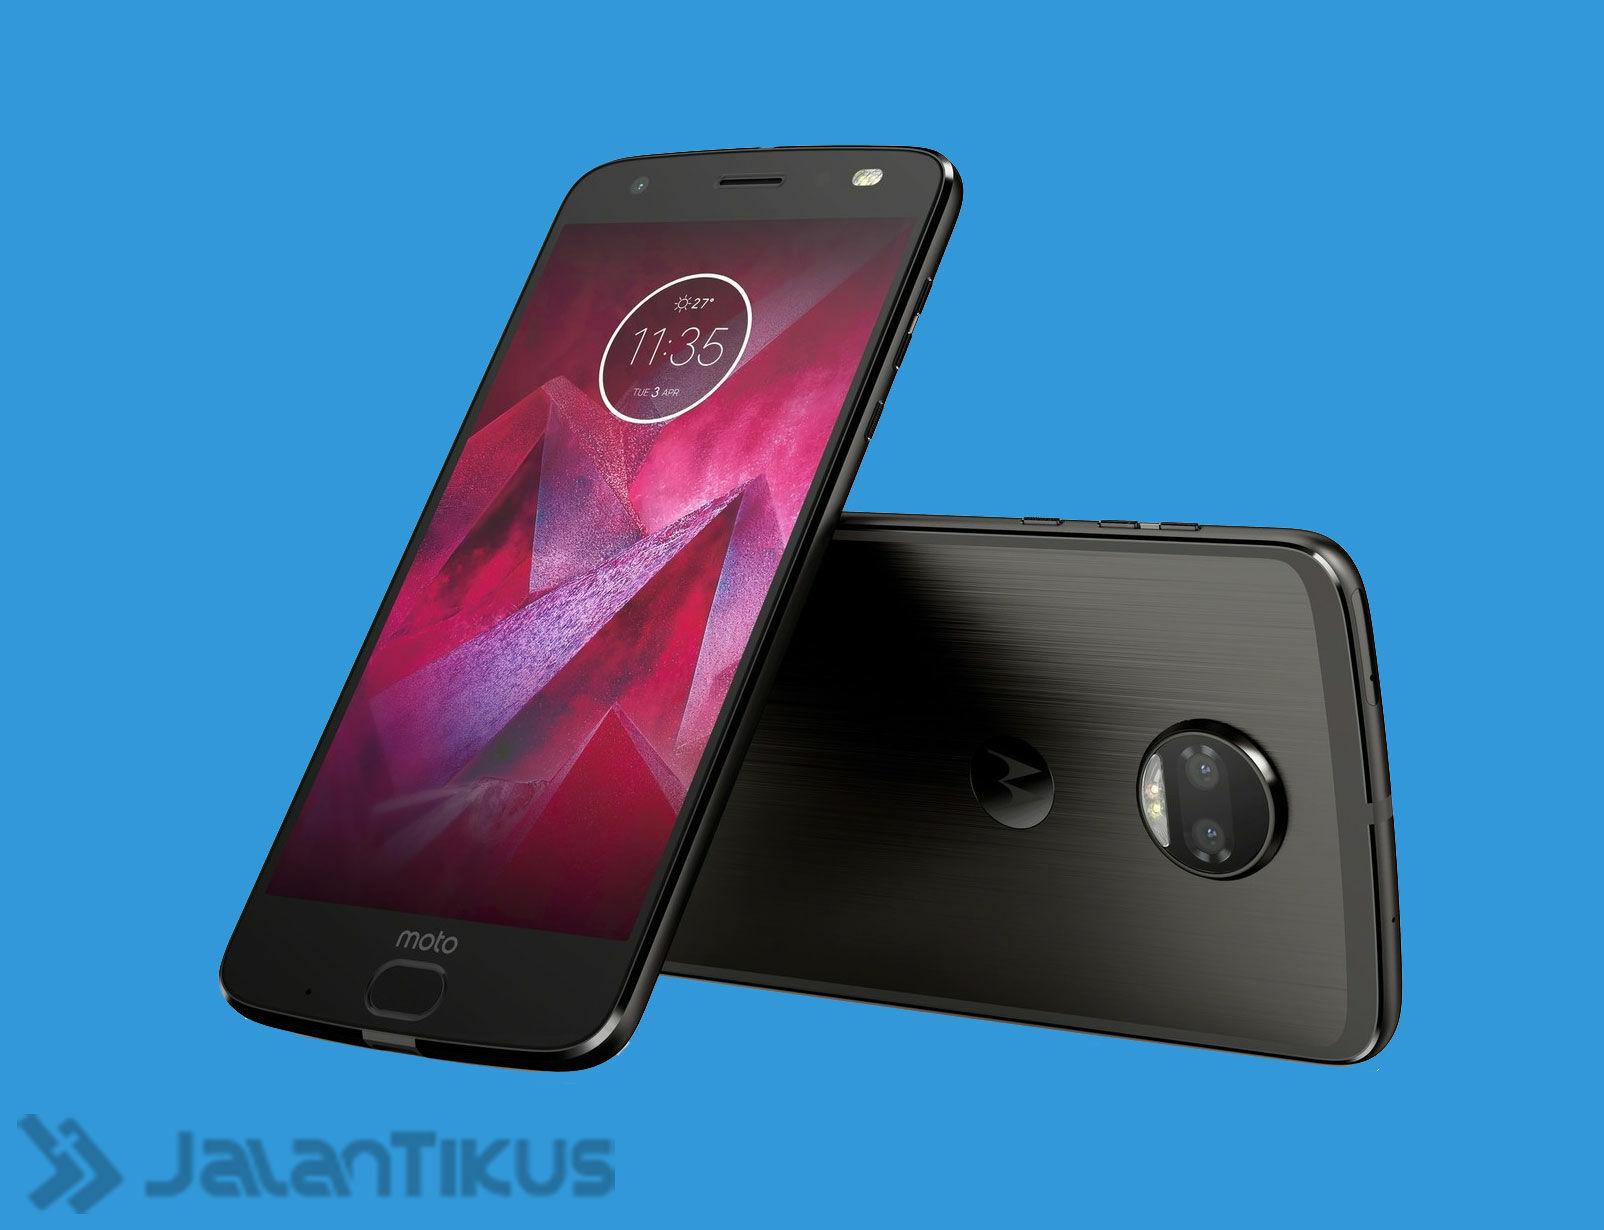 Smartphone Android Terbaru Agustus 2017 3